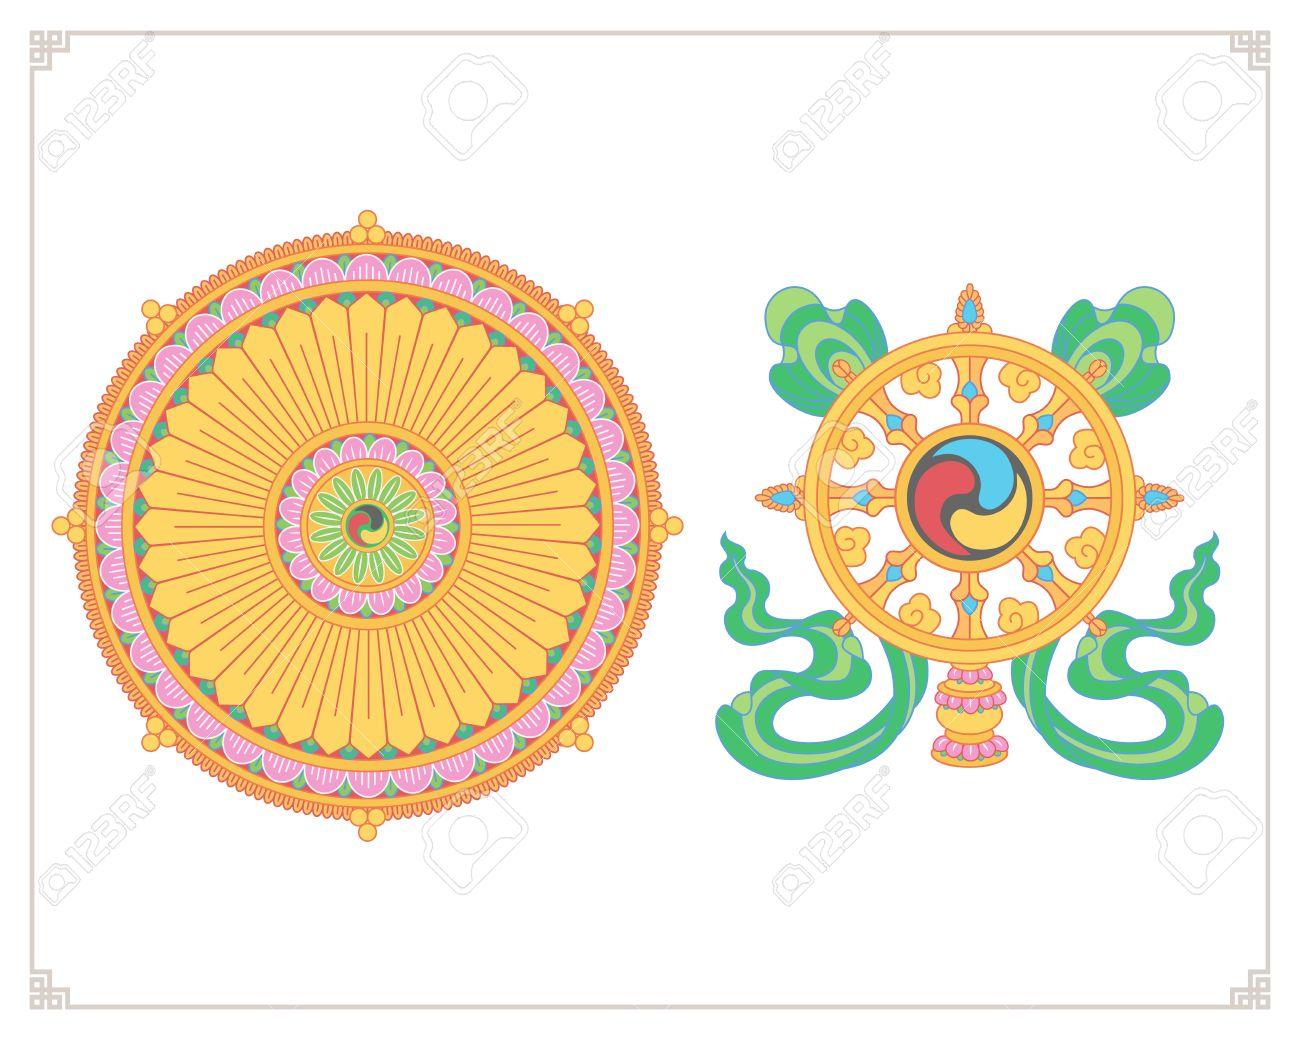 Dharma Wheel, Dharmachakra Icons. Wheel of Dharma in flat design. Buddhism  symbols.